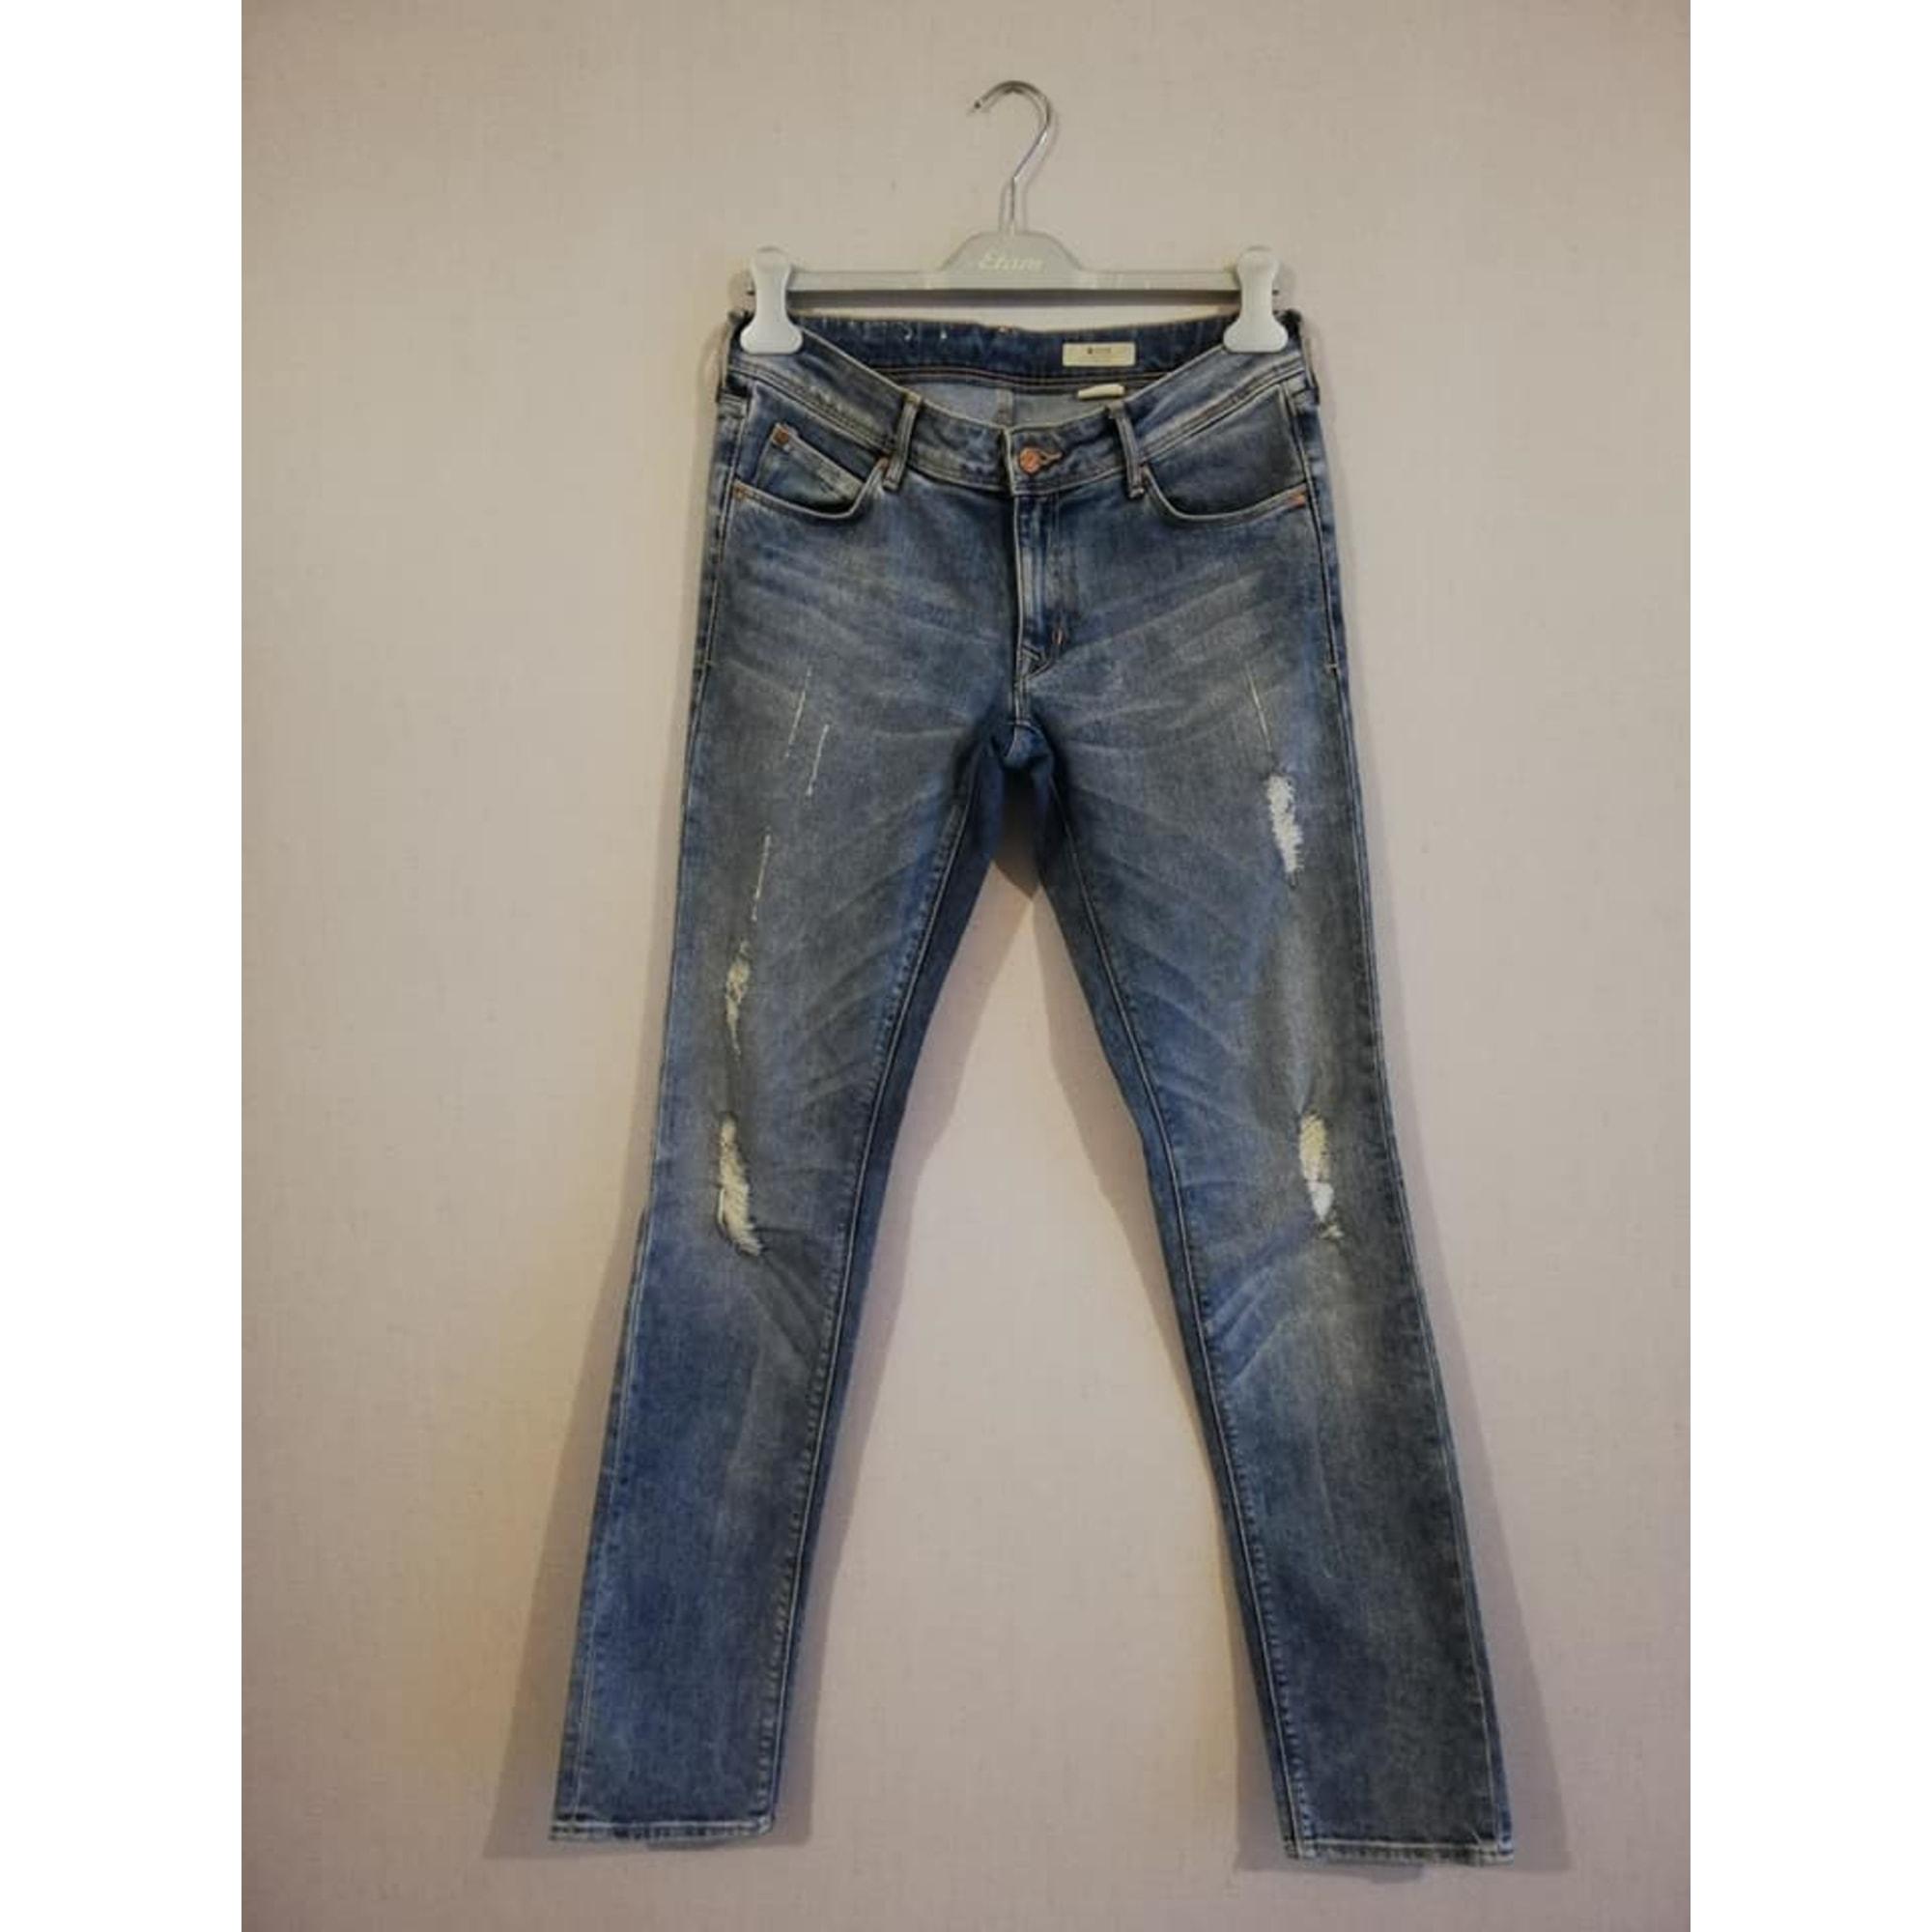 Jeans droit H&M Bleu, bleu marine, bleu turquoise